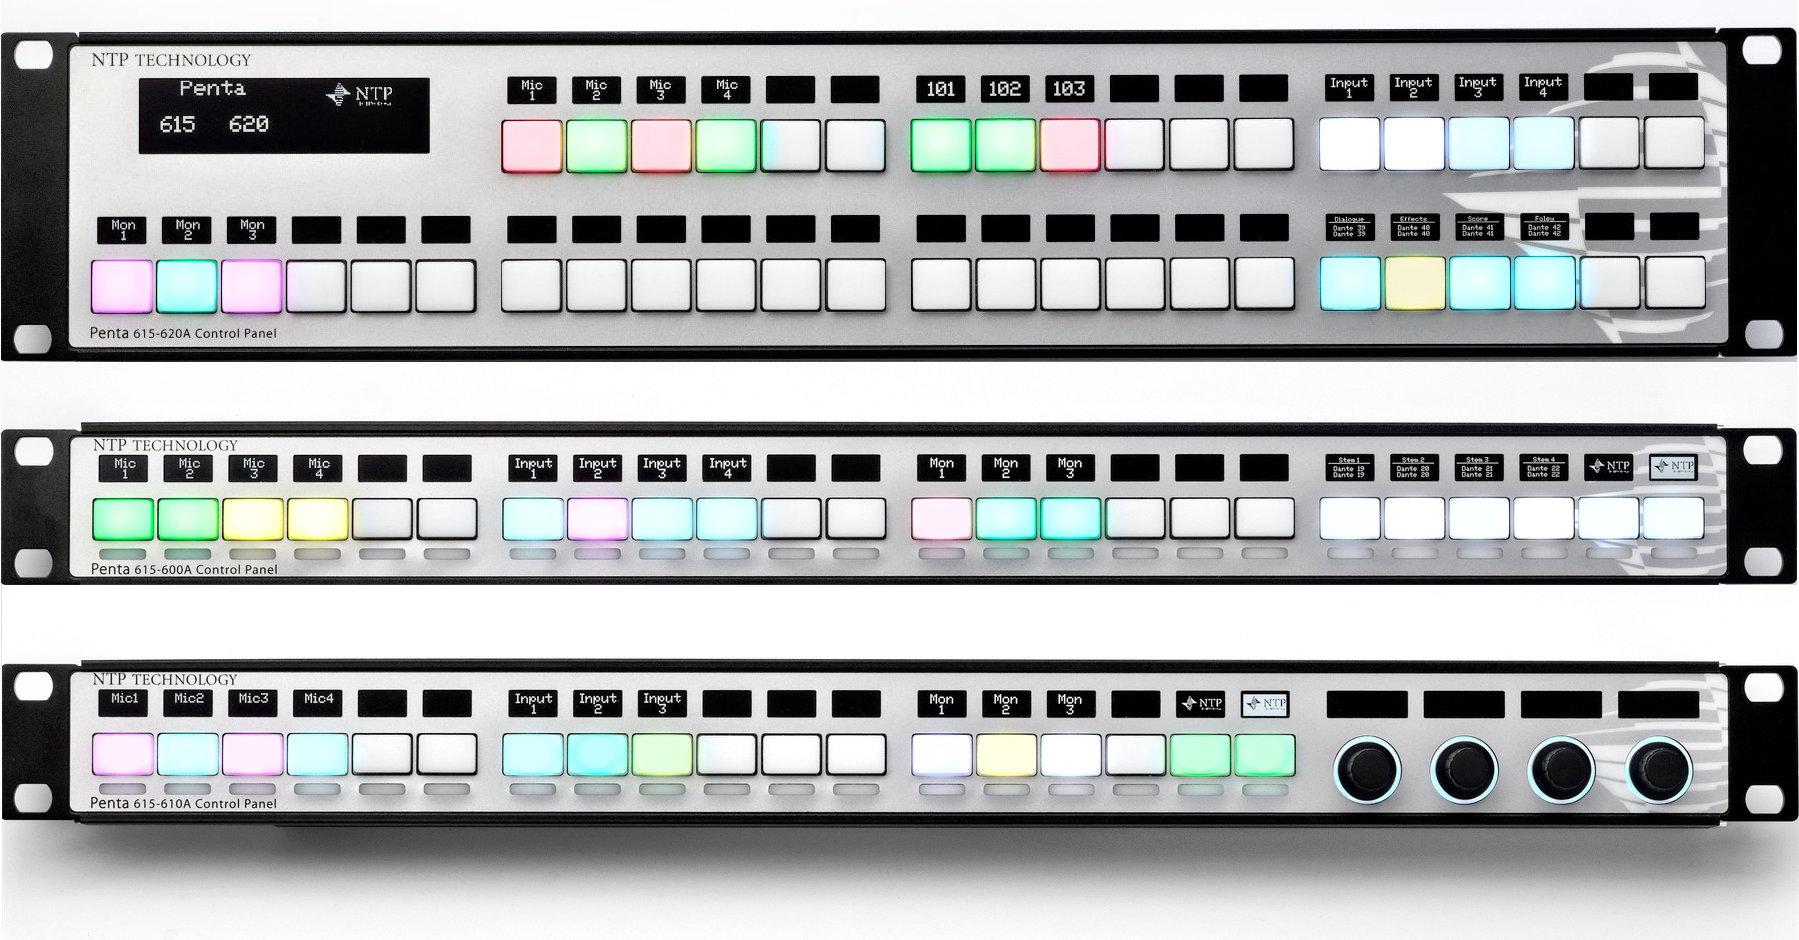 NTP Technology Penta Control Panel series 615